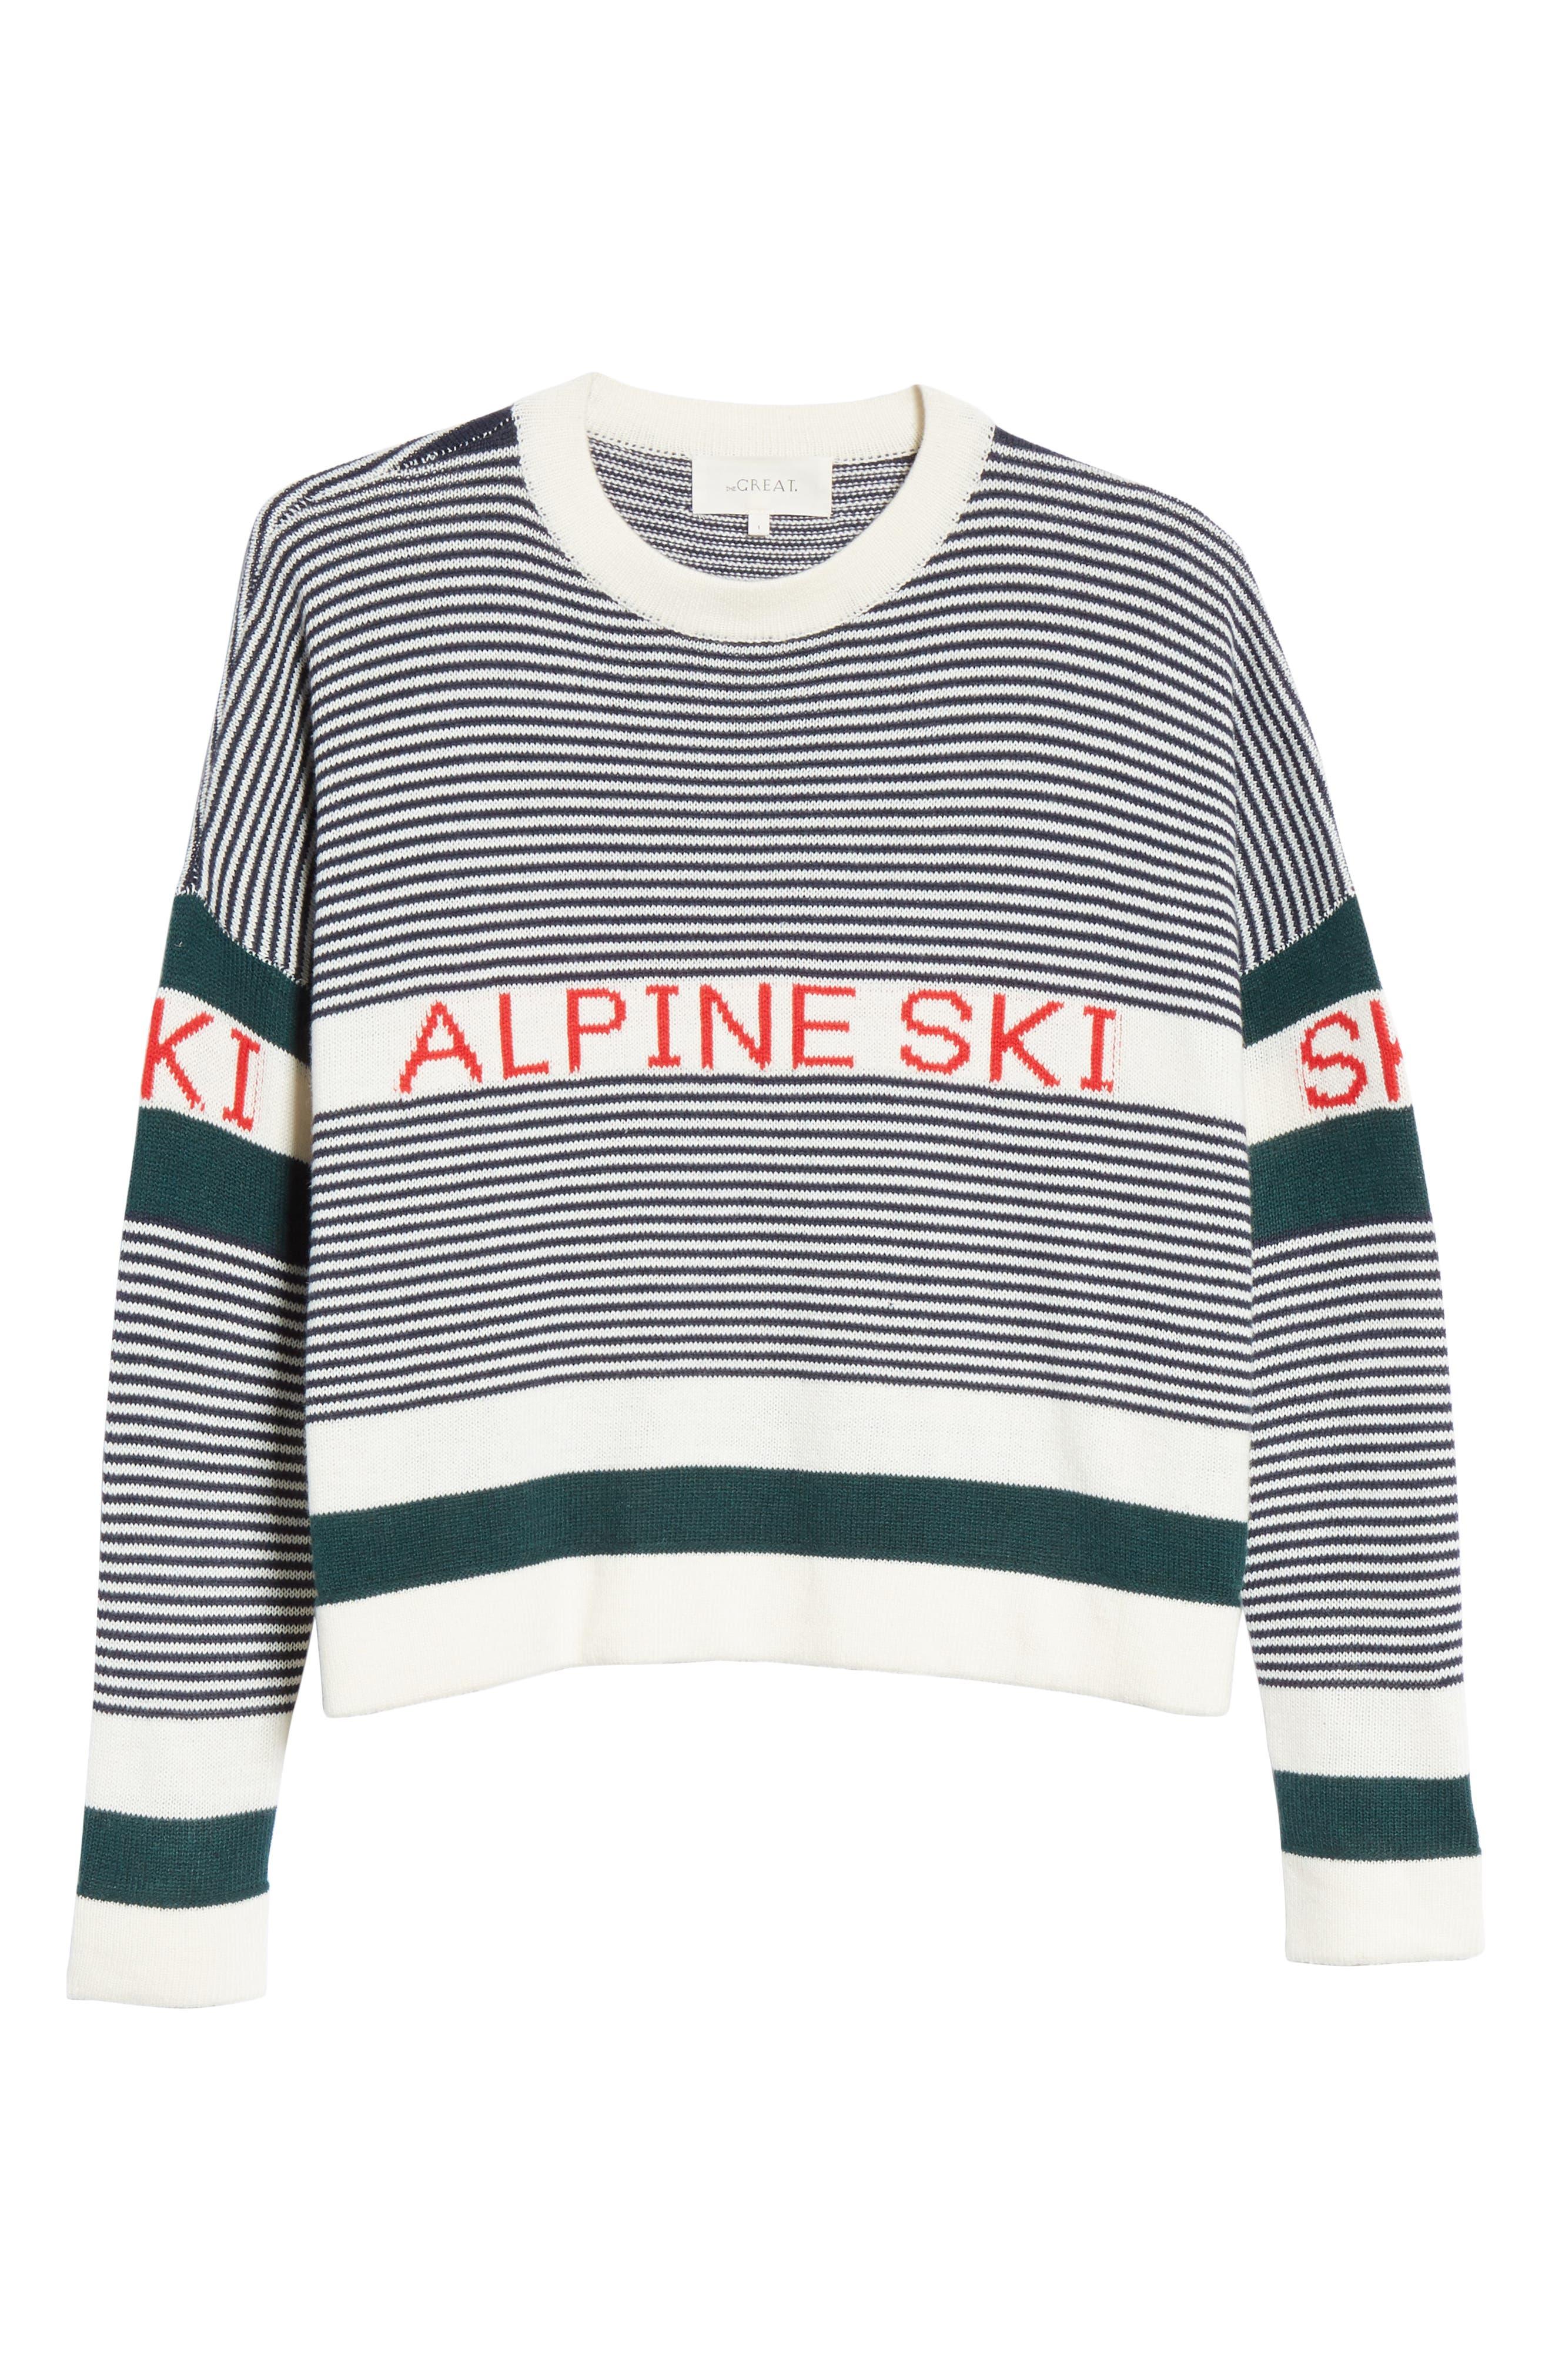 Alpine Ski Sweater,                             Alternate thumbnail 6, color,                             MULTI STRIPE